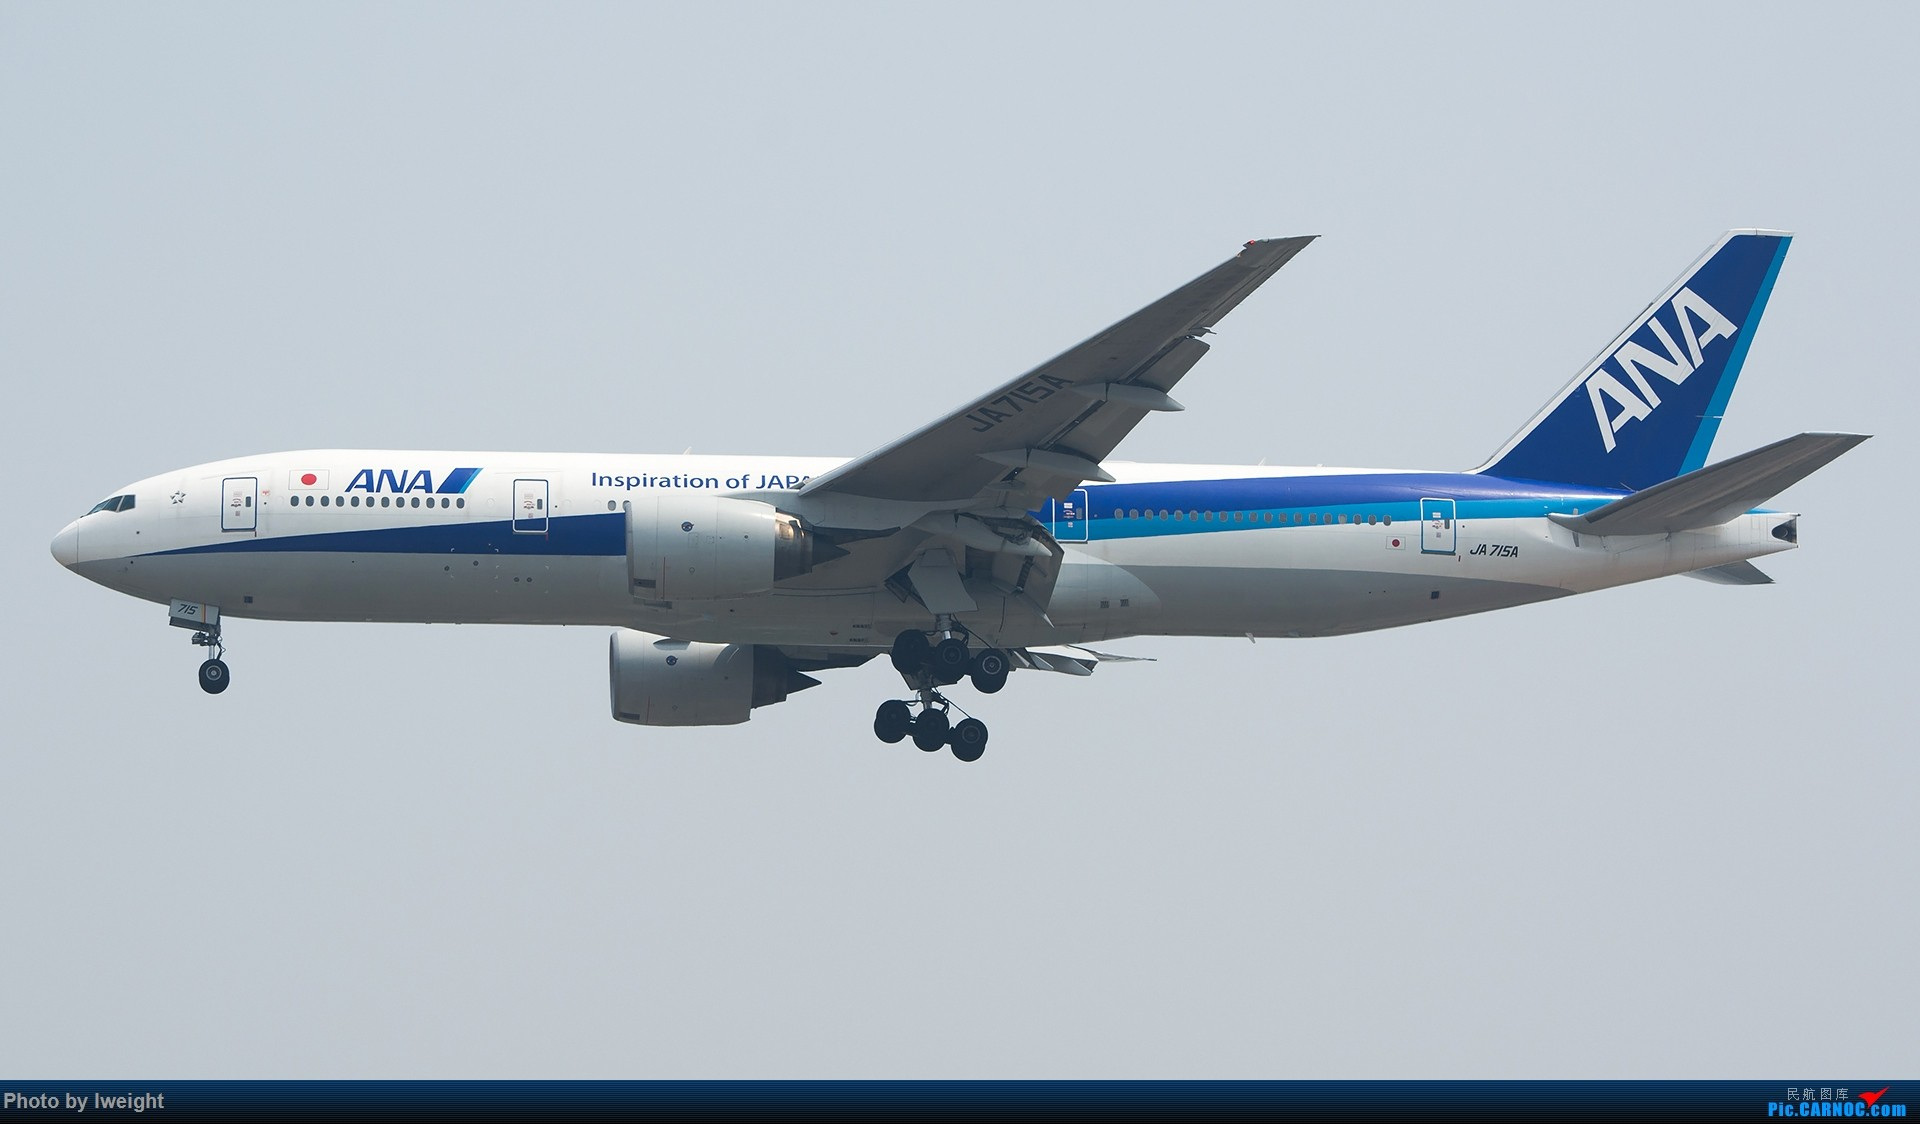 Re:[原创]周末帝都霾天拍机,凑合看看吧【2015-5-23】 BOEING 777-200 JA715A 中国北京首都国际机场